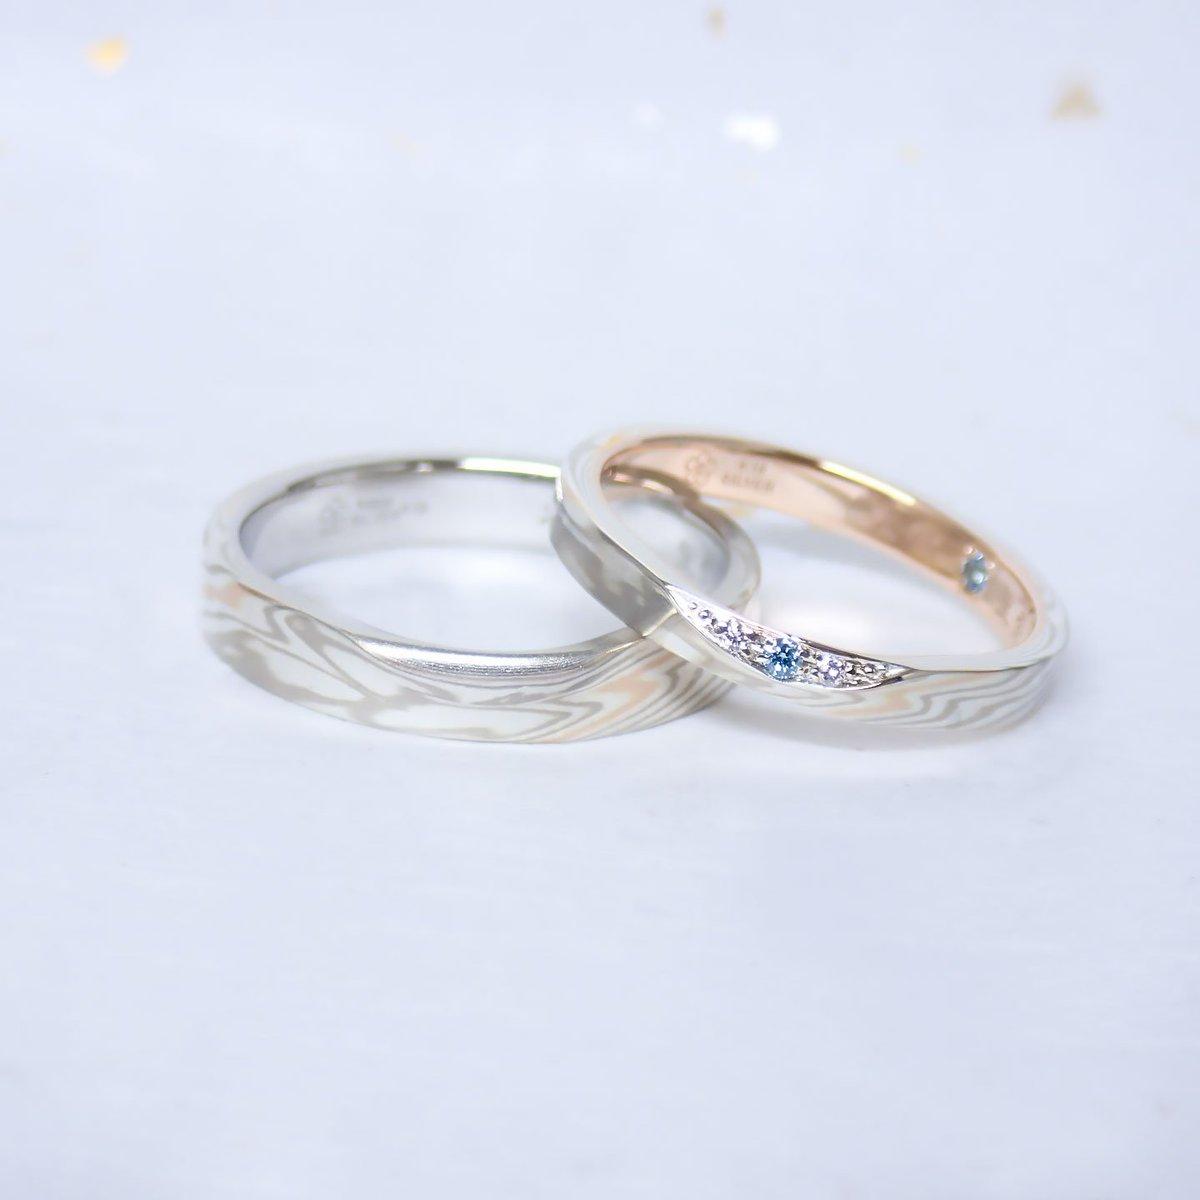 Enchanting Qz Wedding Rings Image Blue Color Ideas